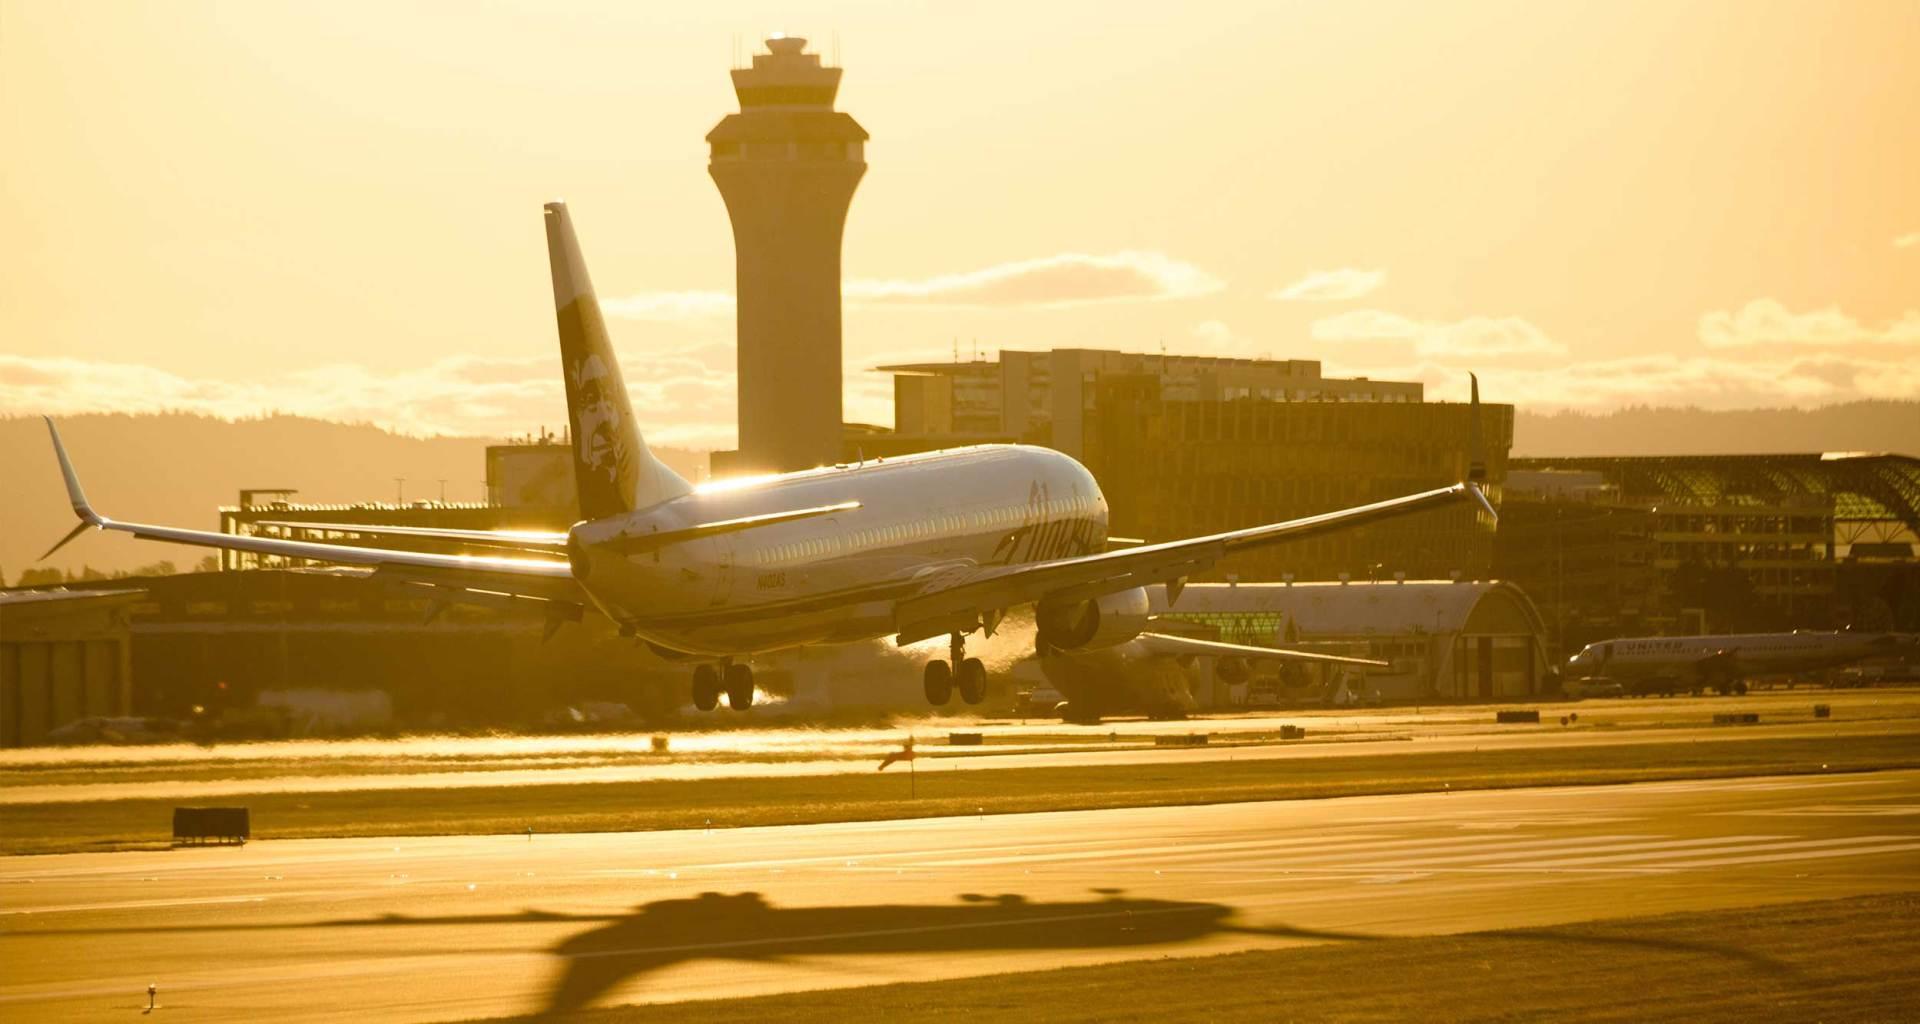 Alaska Airlines plane landing at sunset.